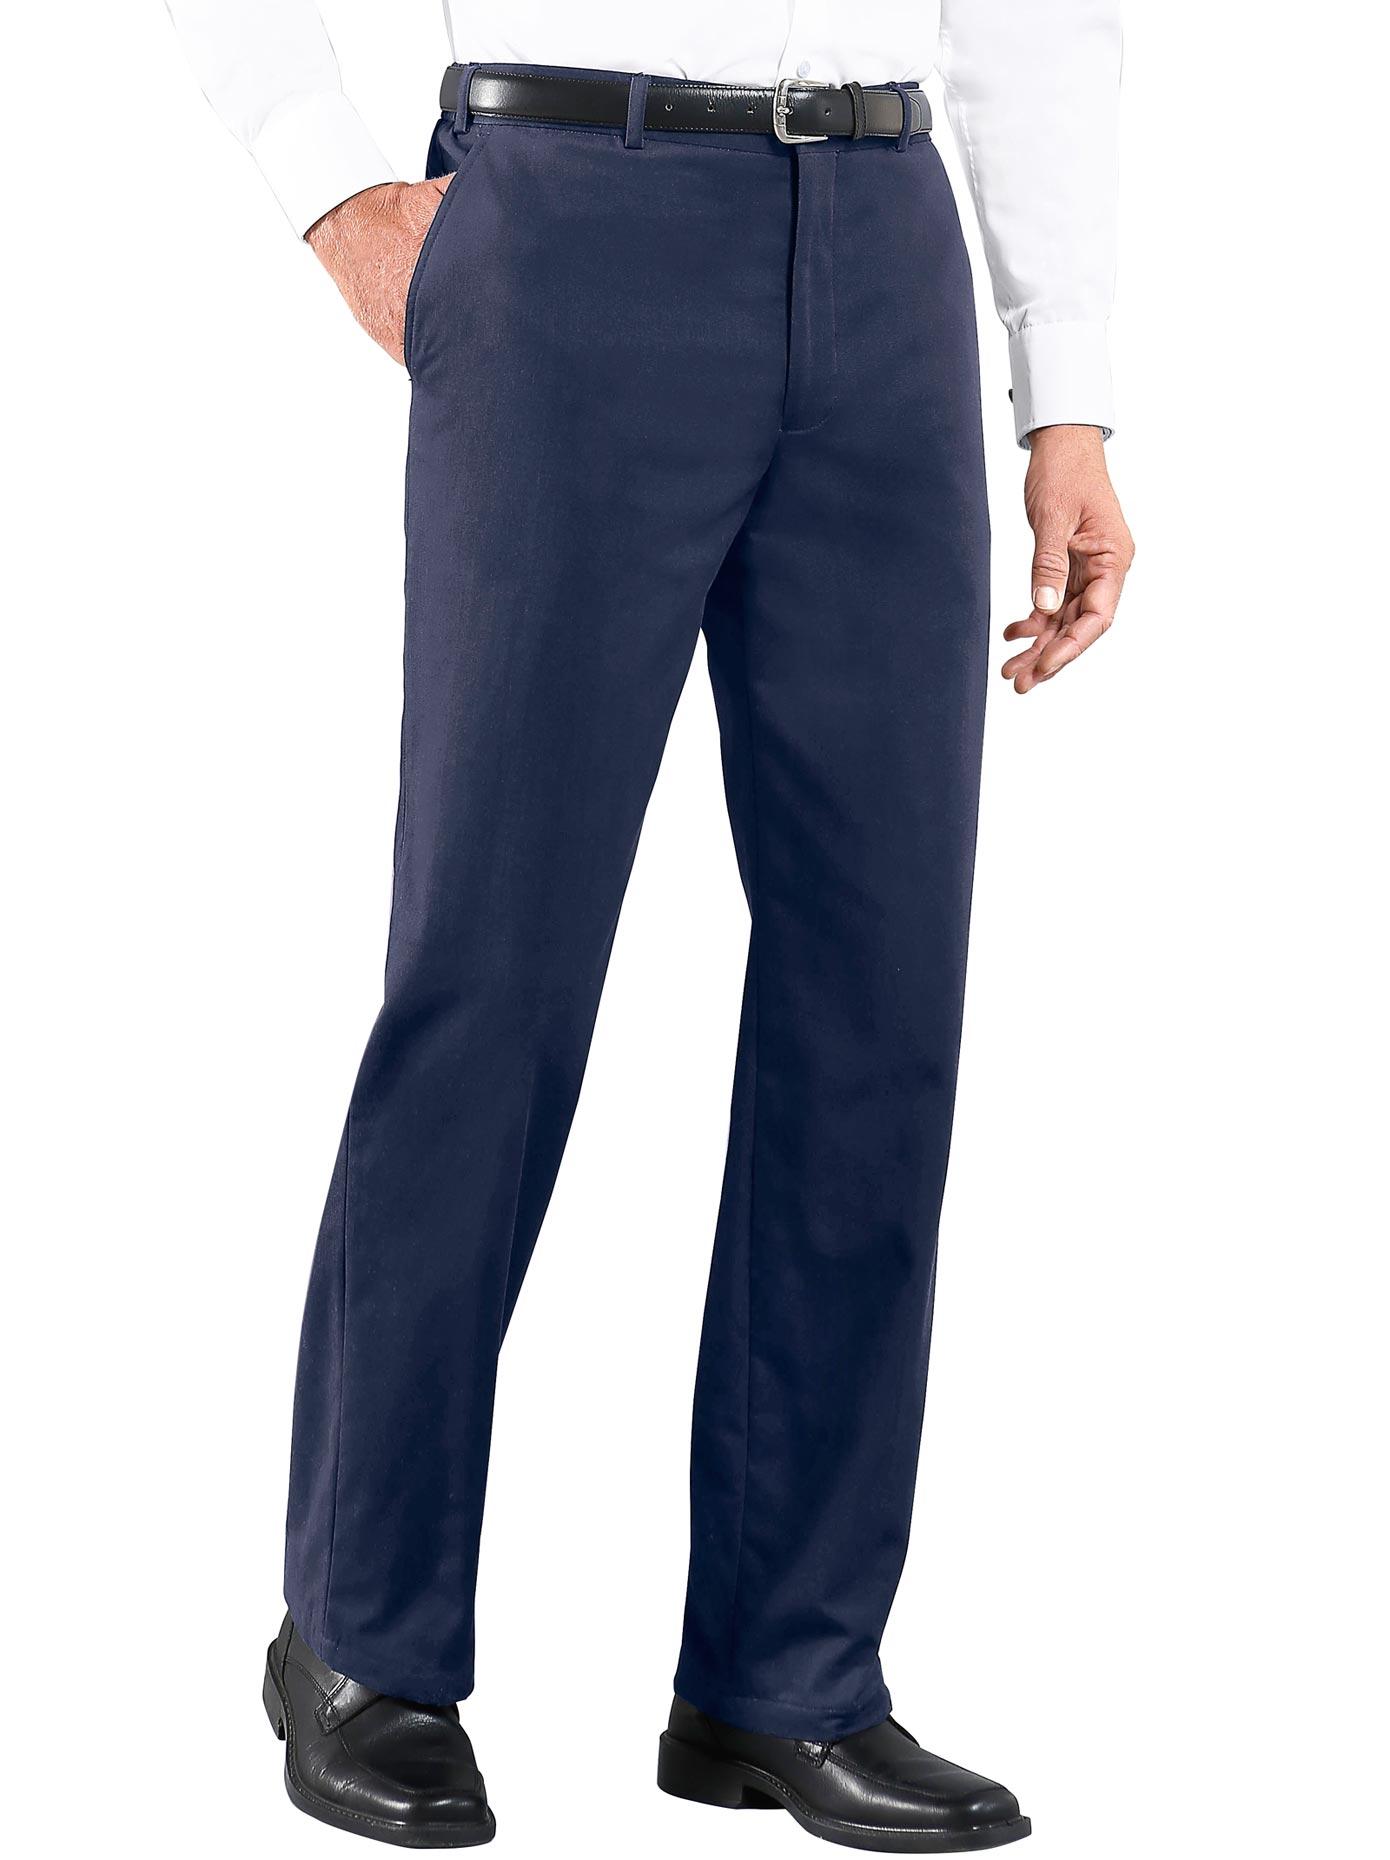 Classic Thermohose blau Herren Thermohosen Outdoorhosen Hosen Hosen, sonstige